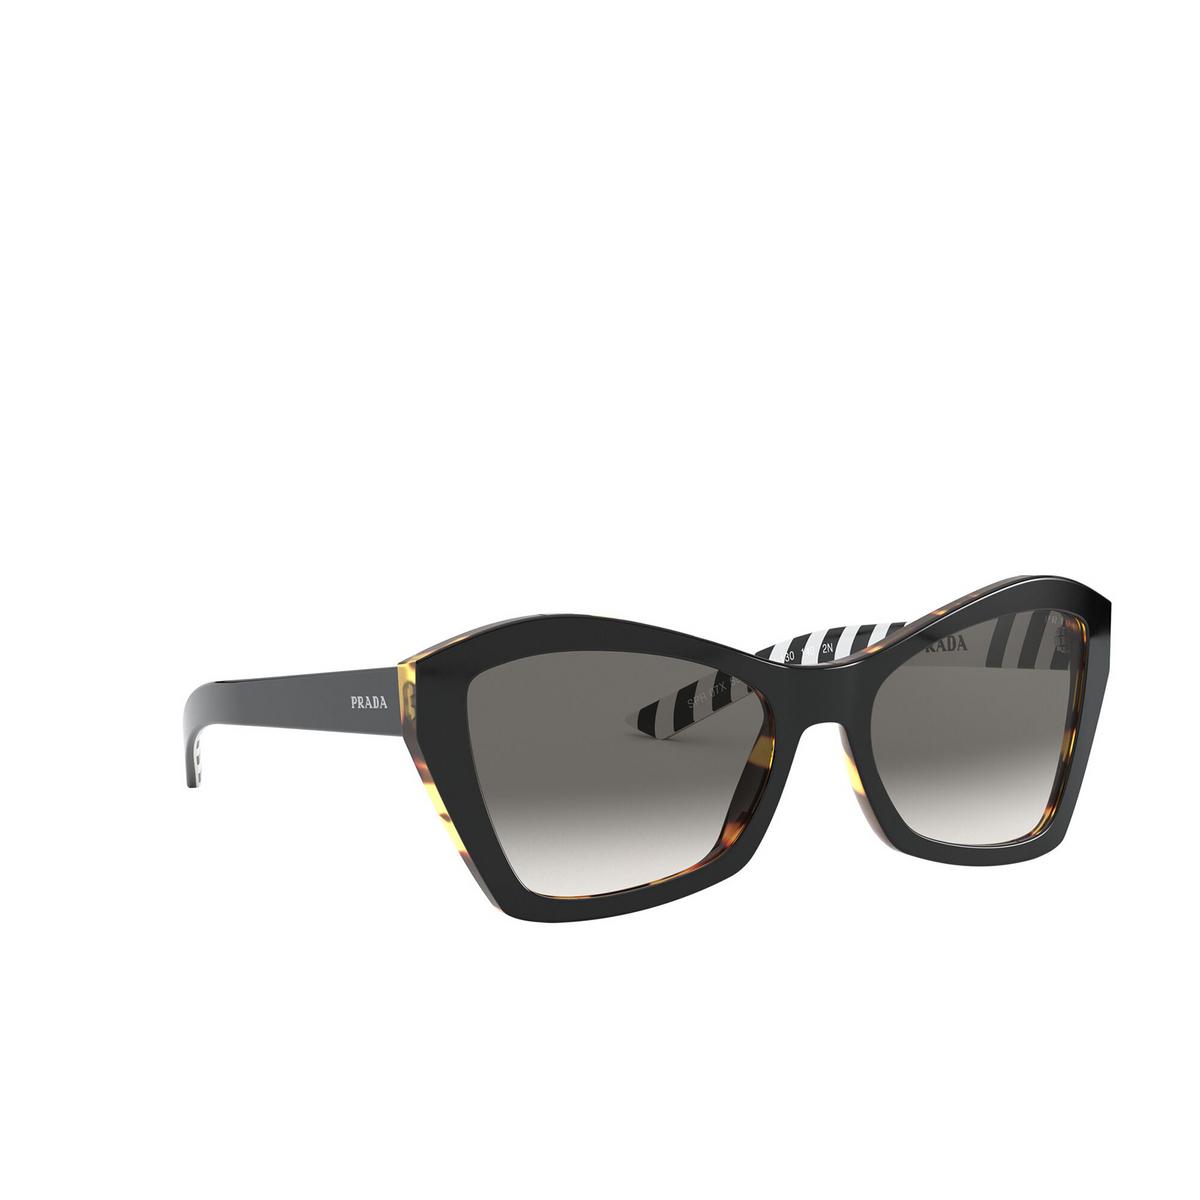 Prada® Butterfly Sunglasses: PR 07XS color Top Black / Medium Havana NAI130 - three-quarters view.